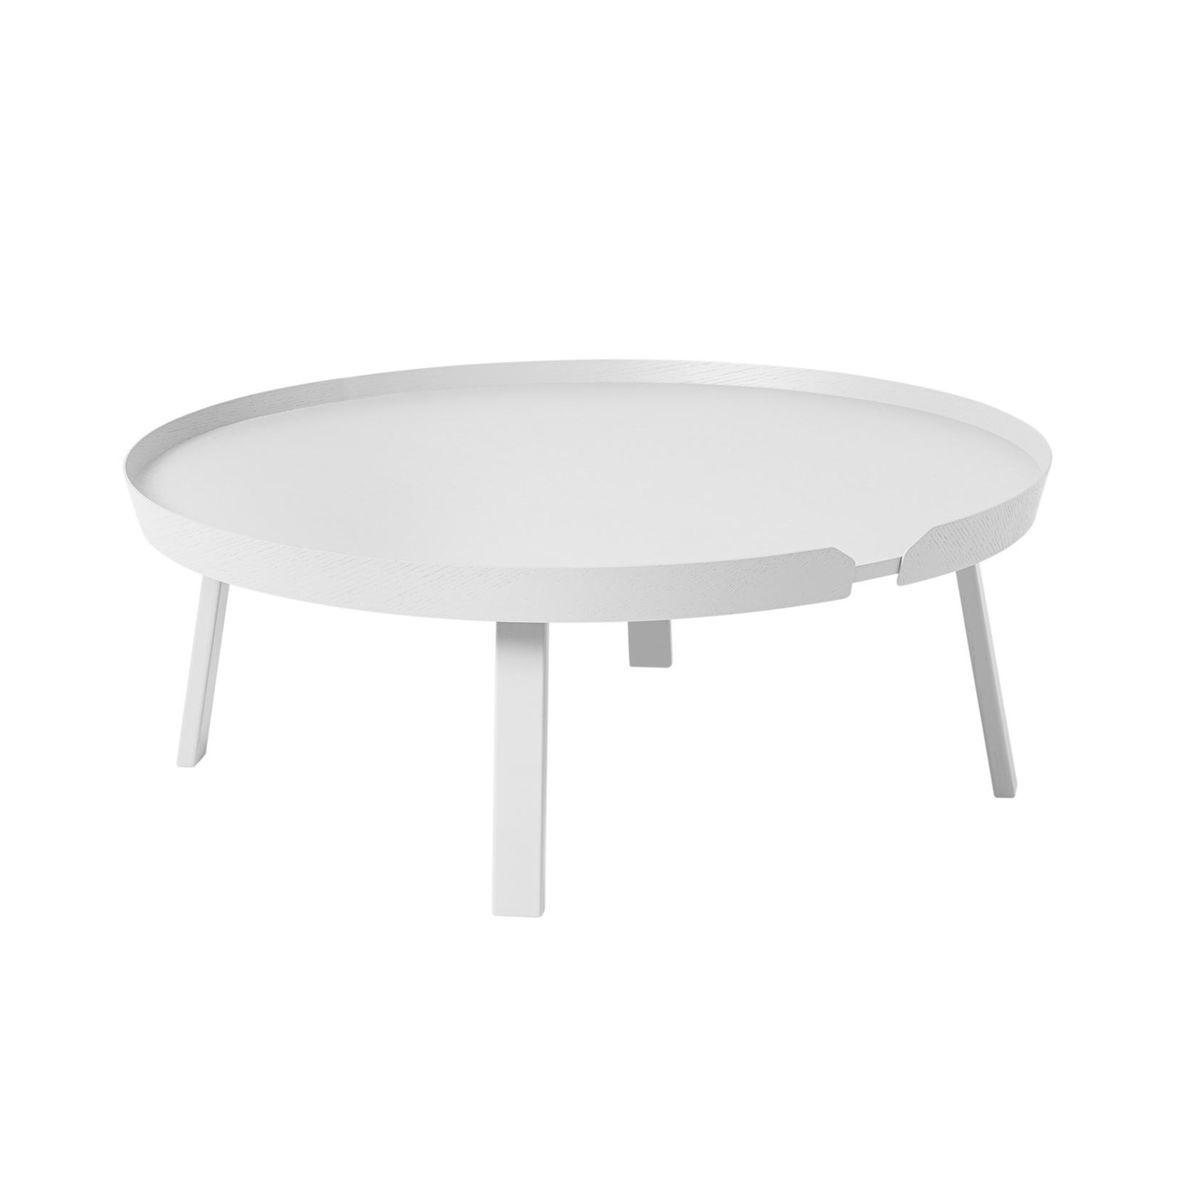 around coffee table xl muuto. Black Bedroom Furniture Sets. Home Design Ideas